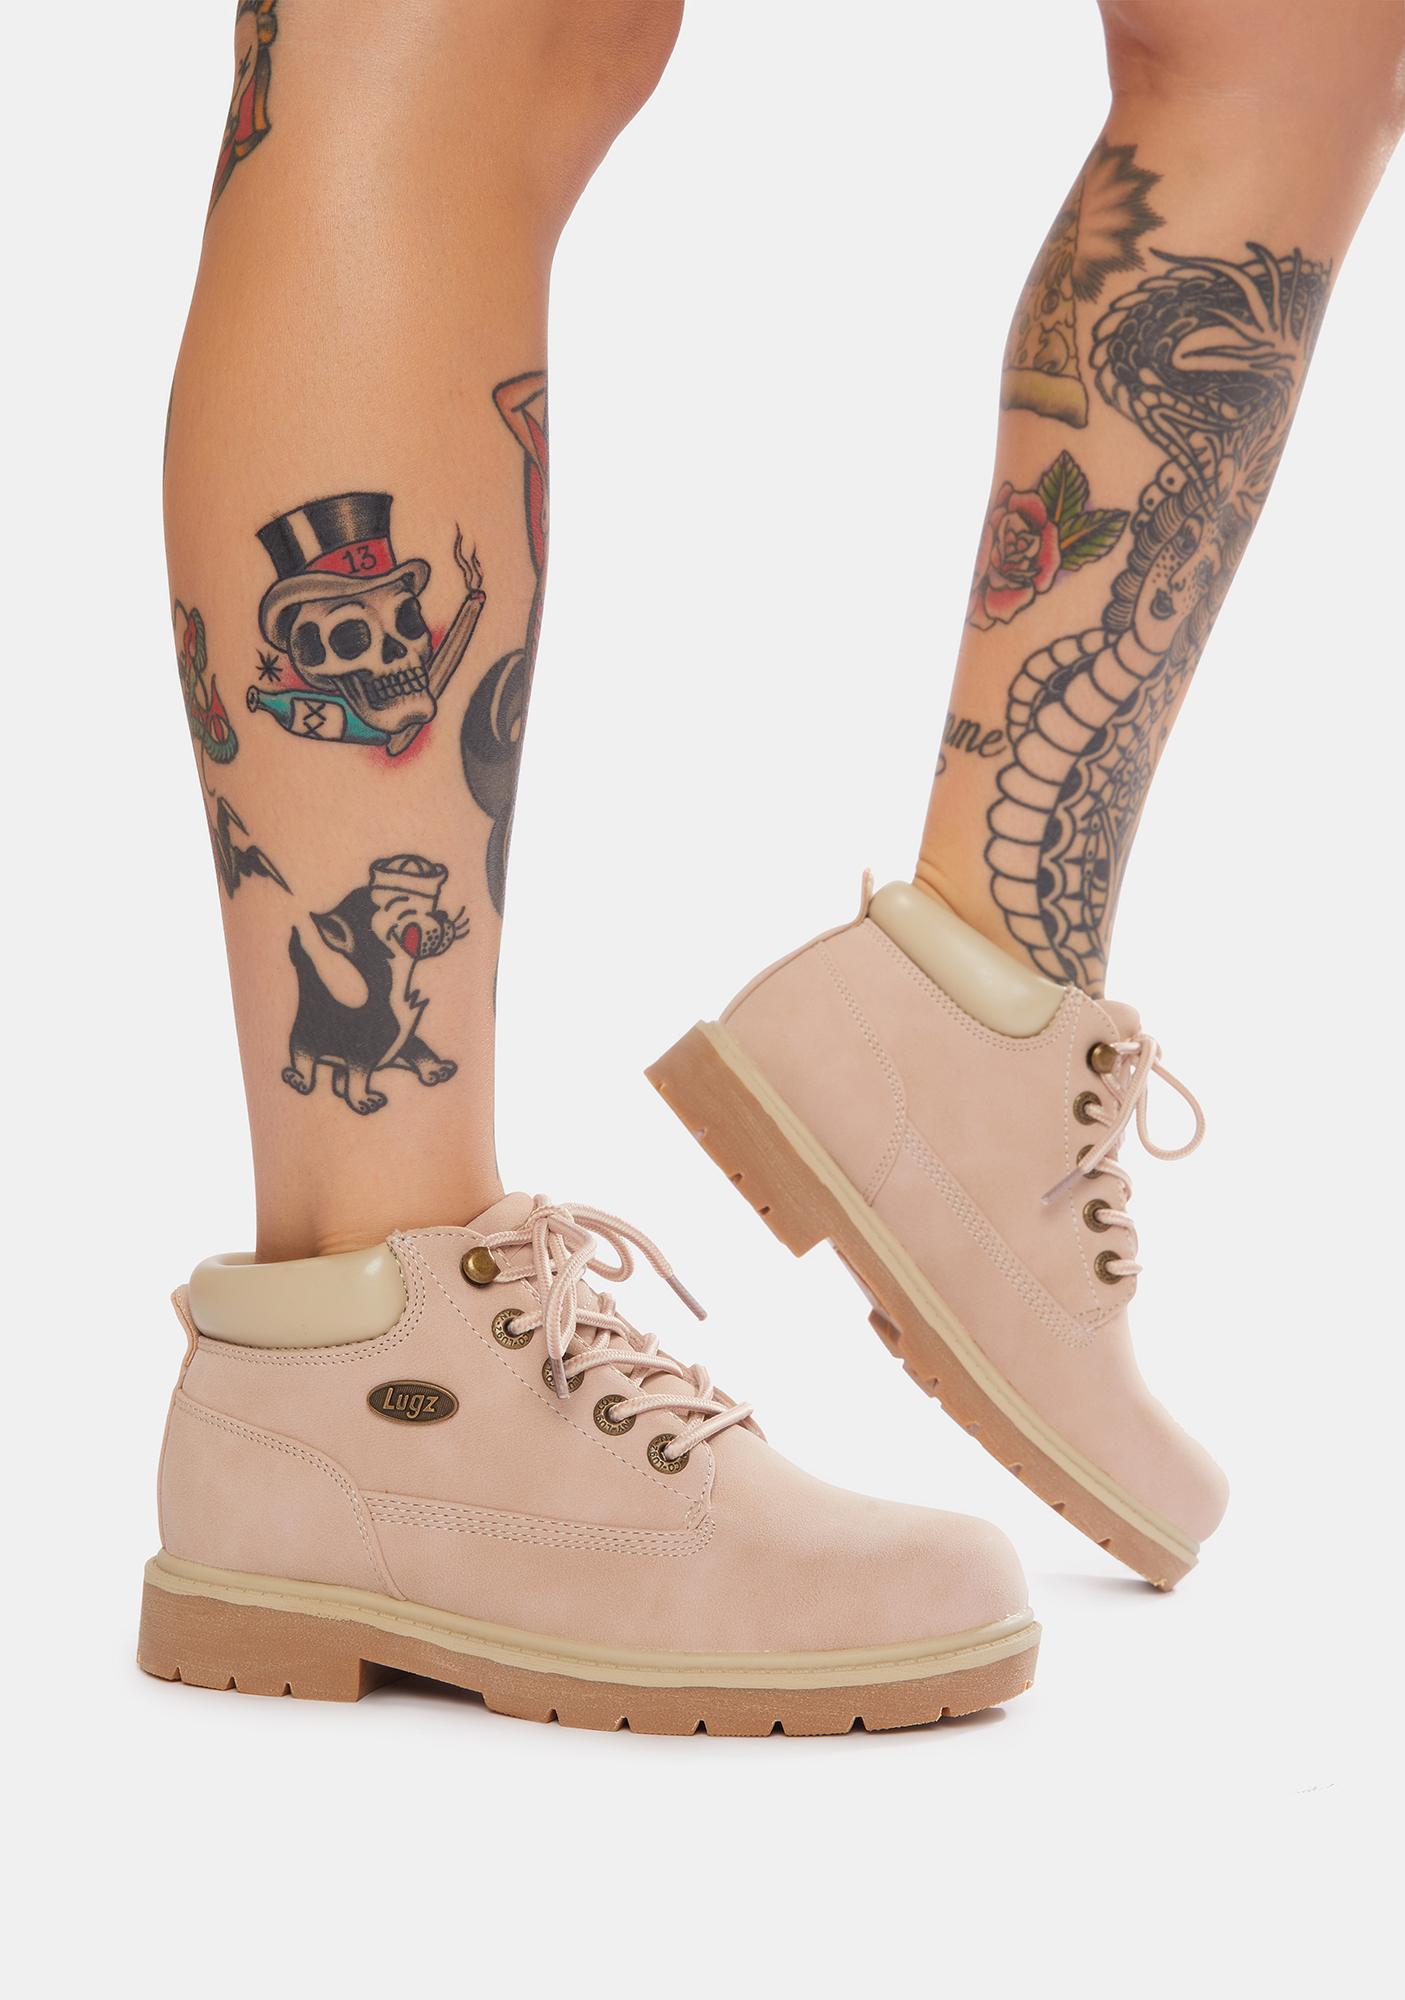 Lugz Soft Pink Drifter LX Chukka Boots